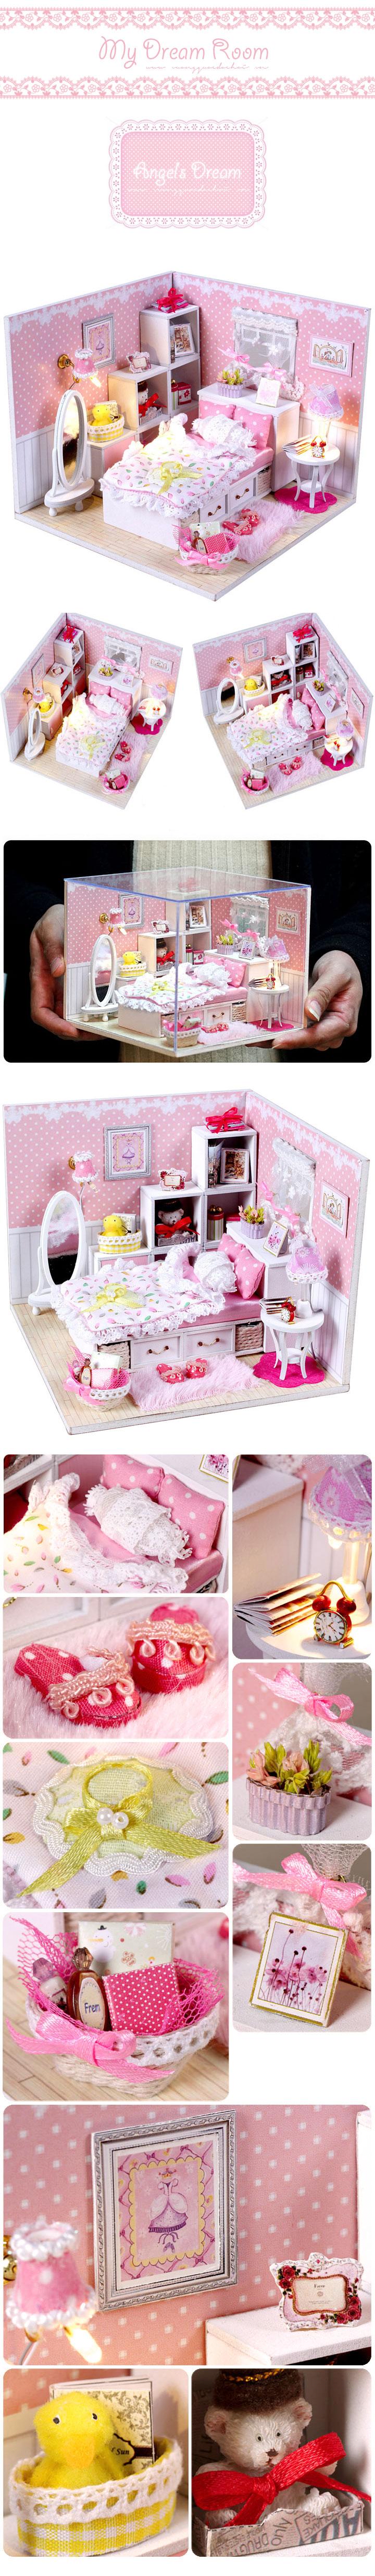 diy miniature dreamroom angelsdream